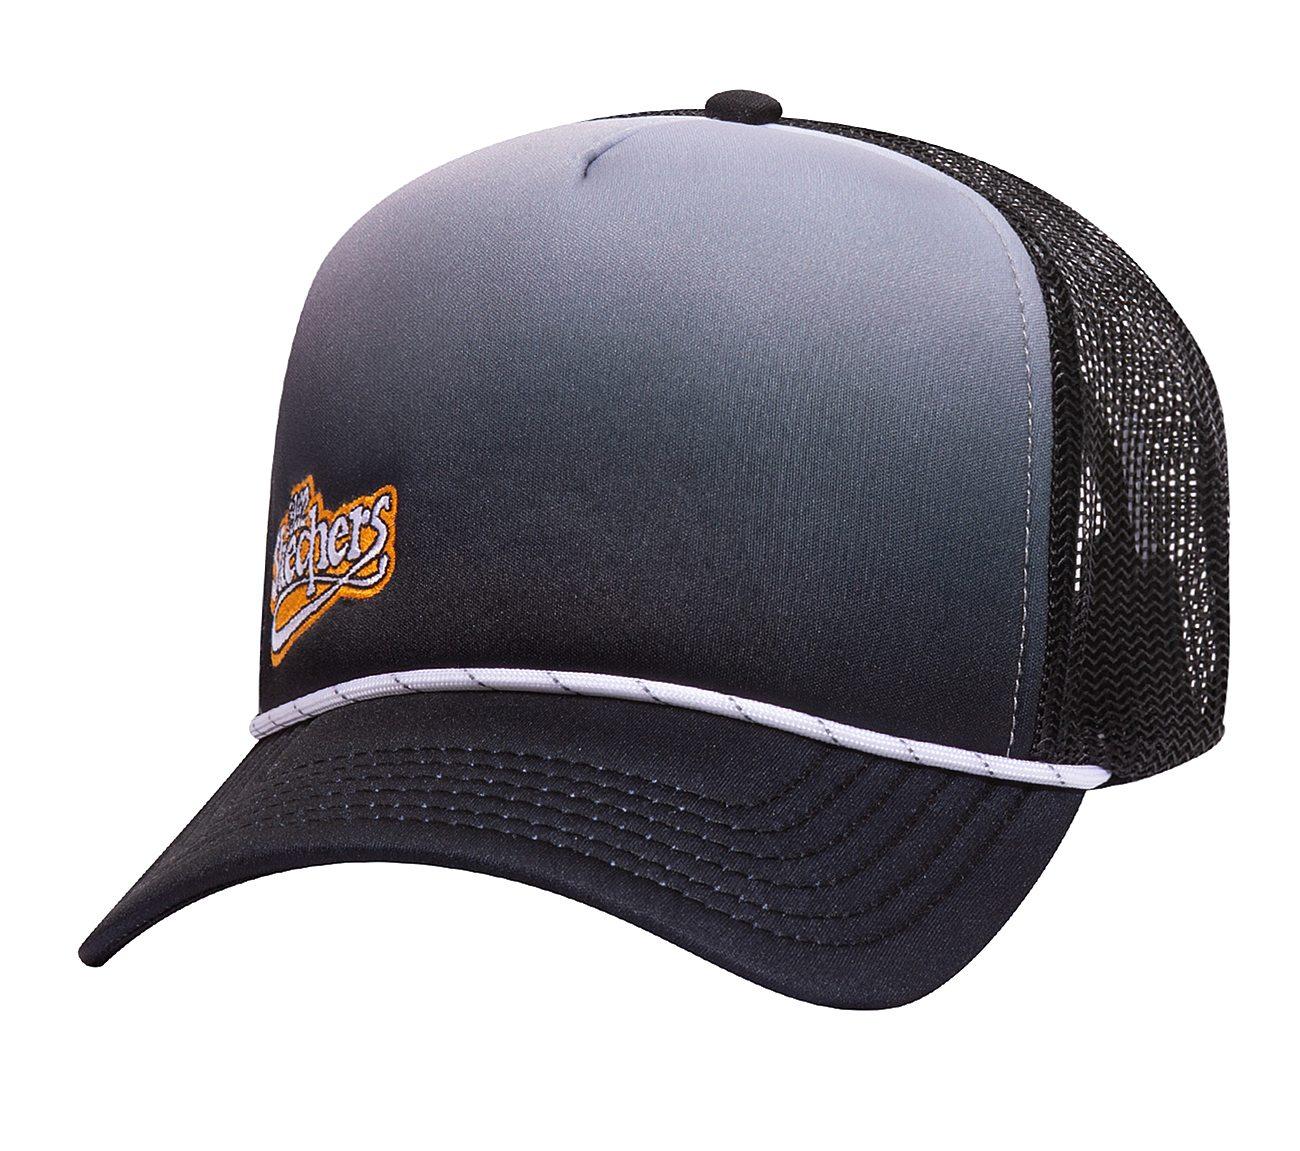 2836e2362edd7 Buy SKECHERS Gradient Heritage Trucker Hat Hats Shoes only  20.00